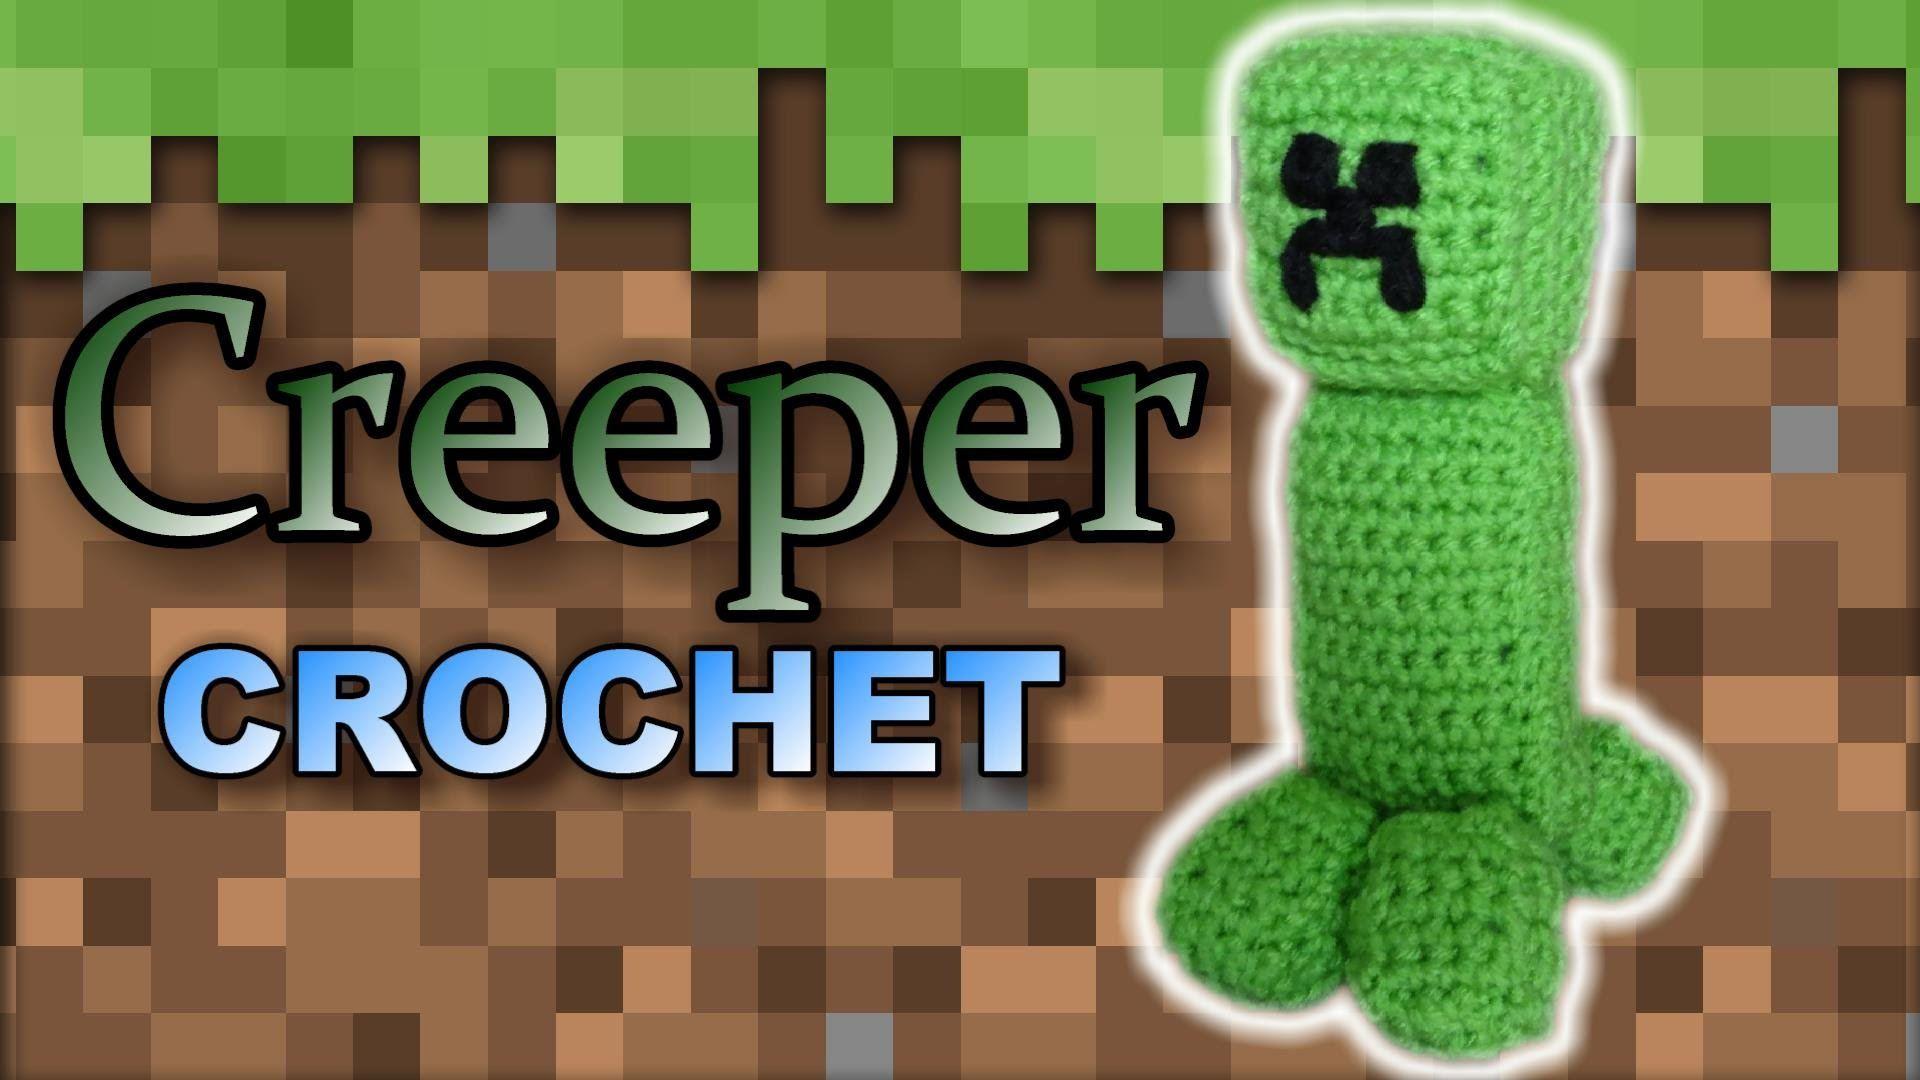 minecraft+crochet+amigurumi | Minecraft Creeper Crochet - Easy ...